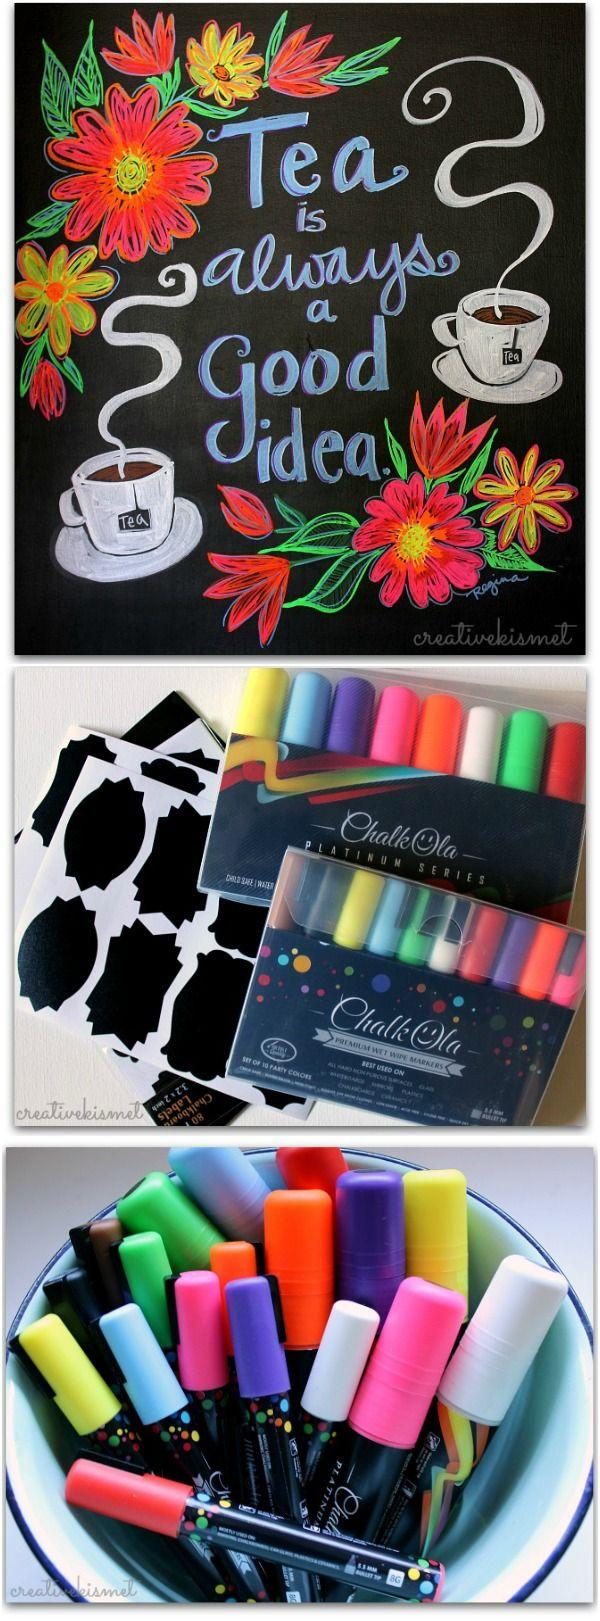 Chalkola – Chalk Board Markers w/ discount code